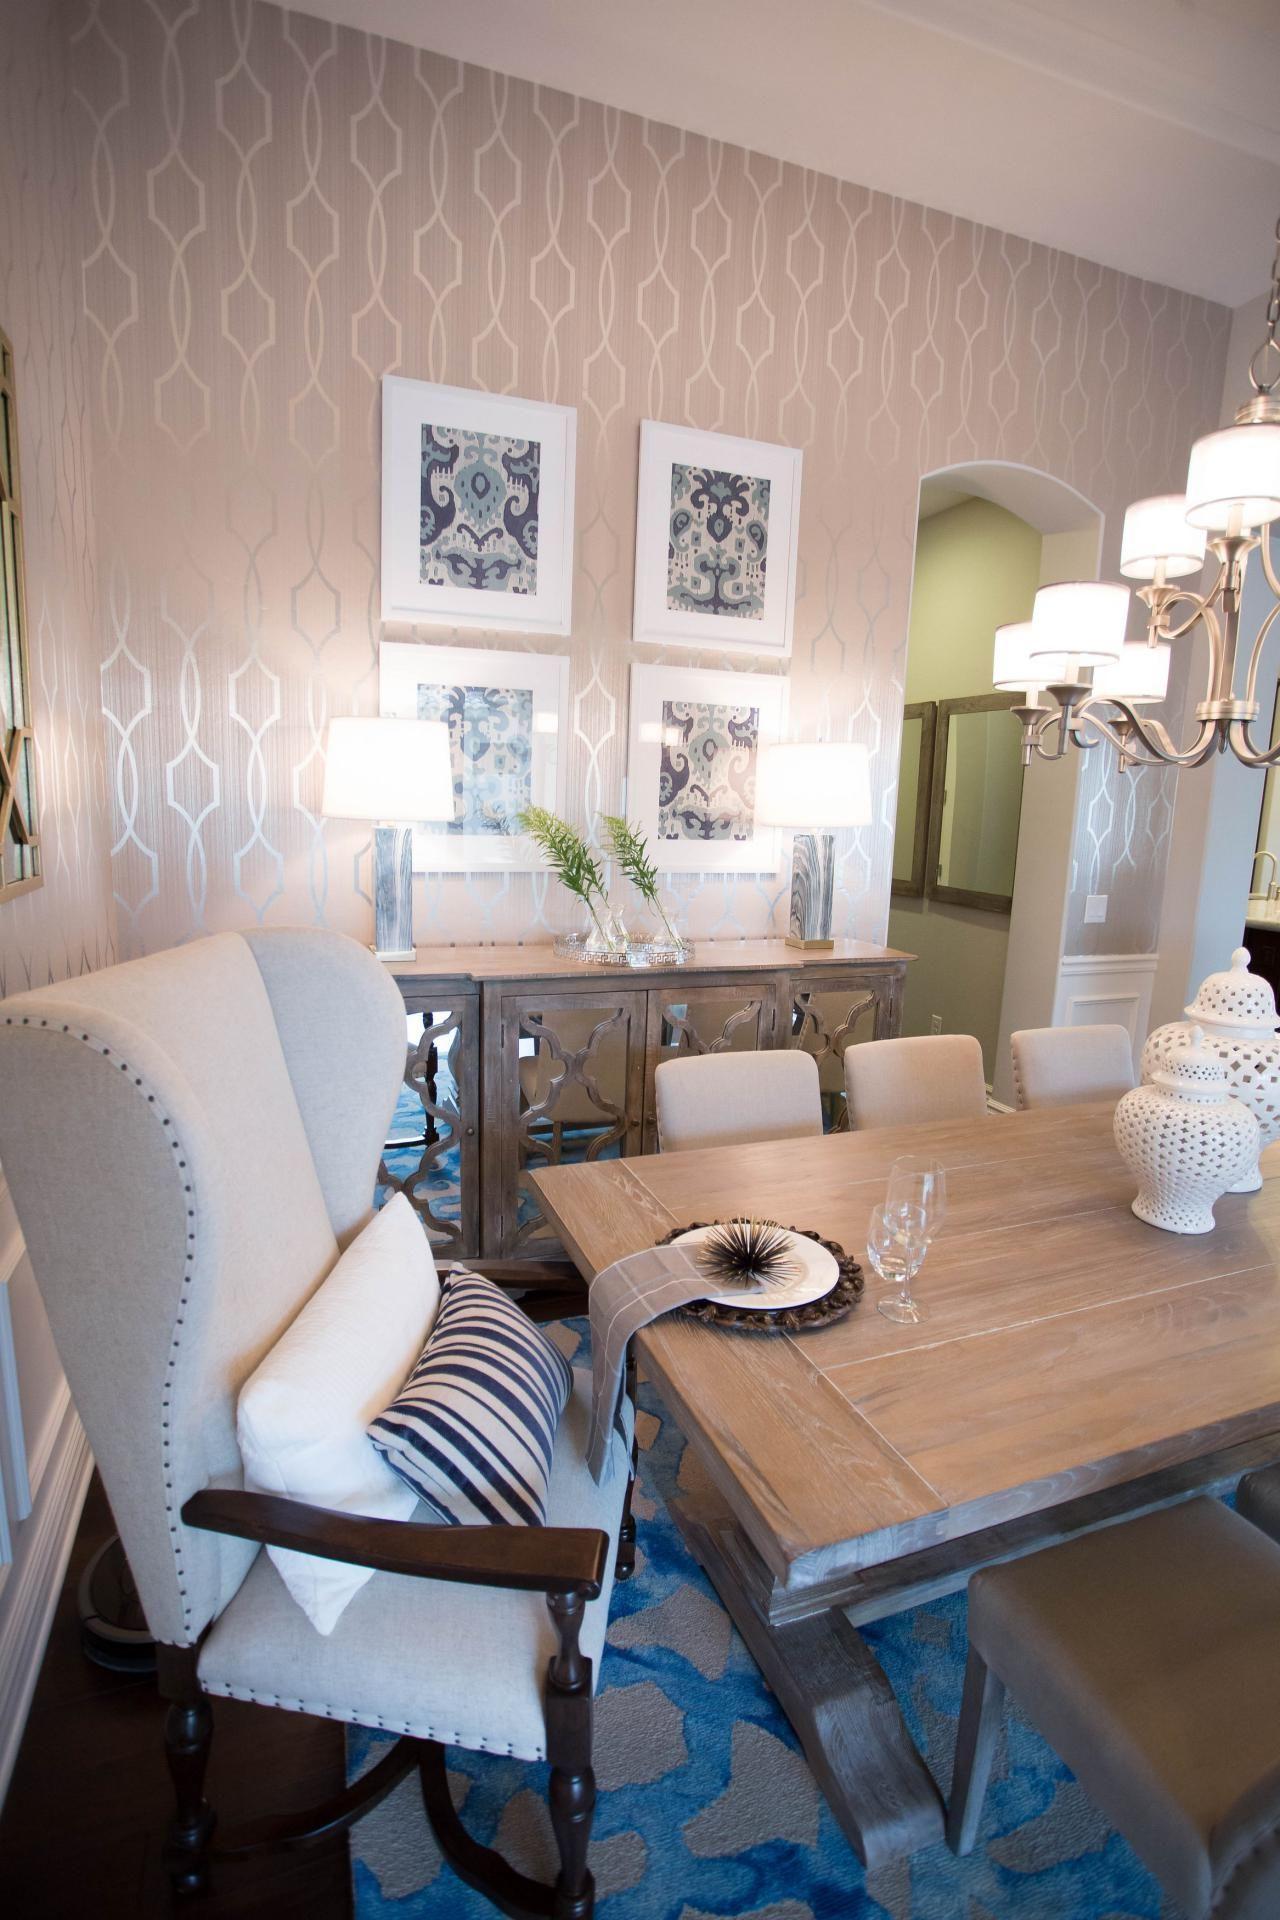 Décor for Formal Dining Room Designs   Dining room design ...